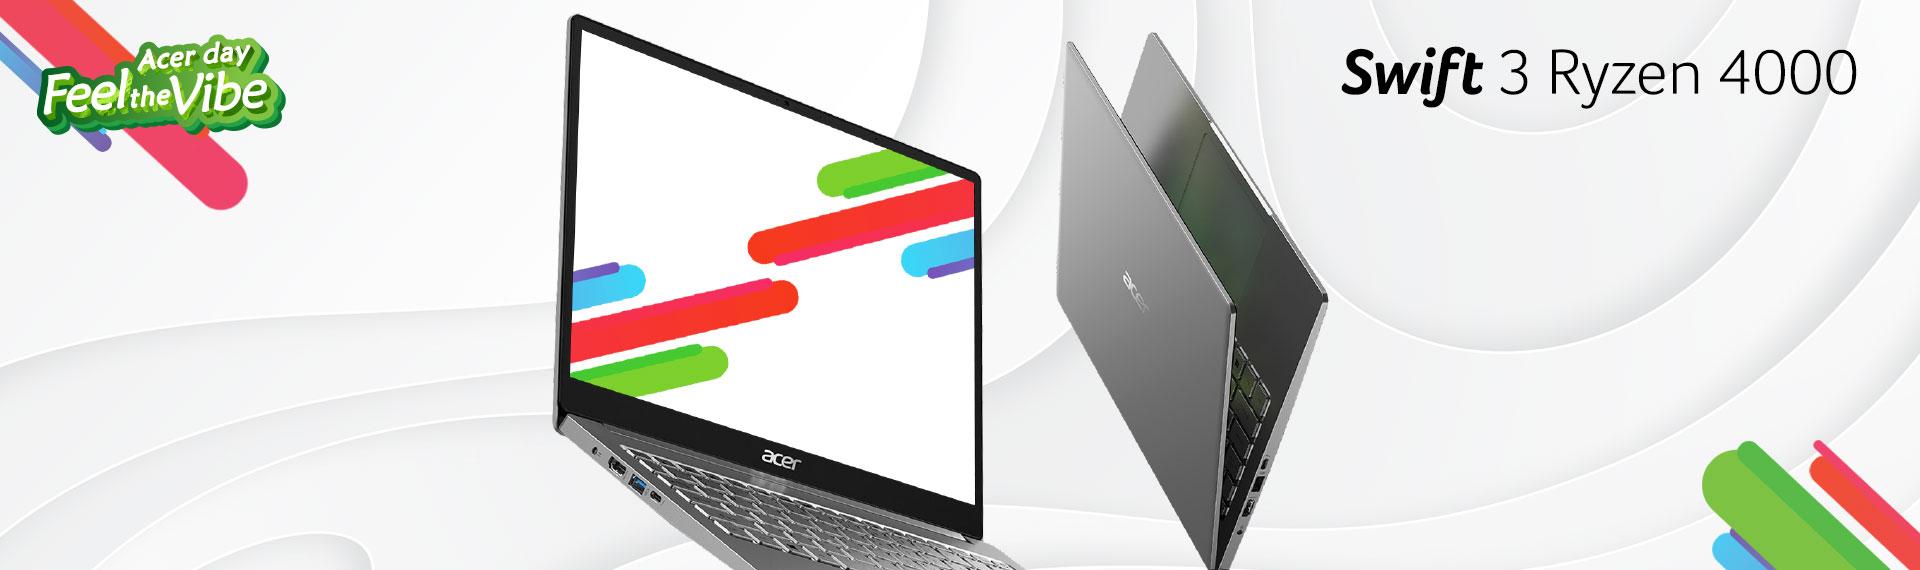 Swift 3 Ryzen 4000 (SF314-42), Laptop Kencang Berbalut Desain Elegan